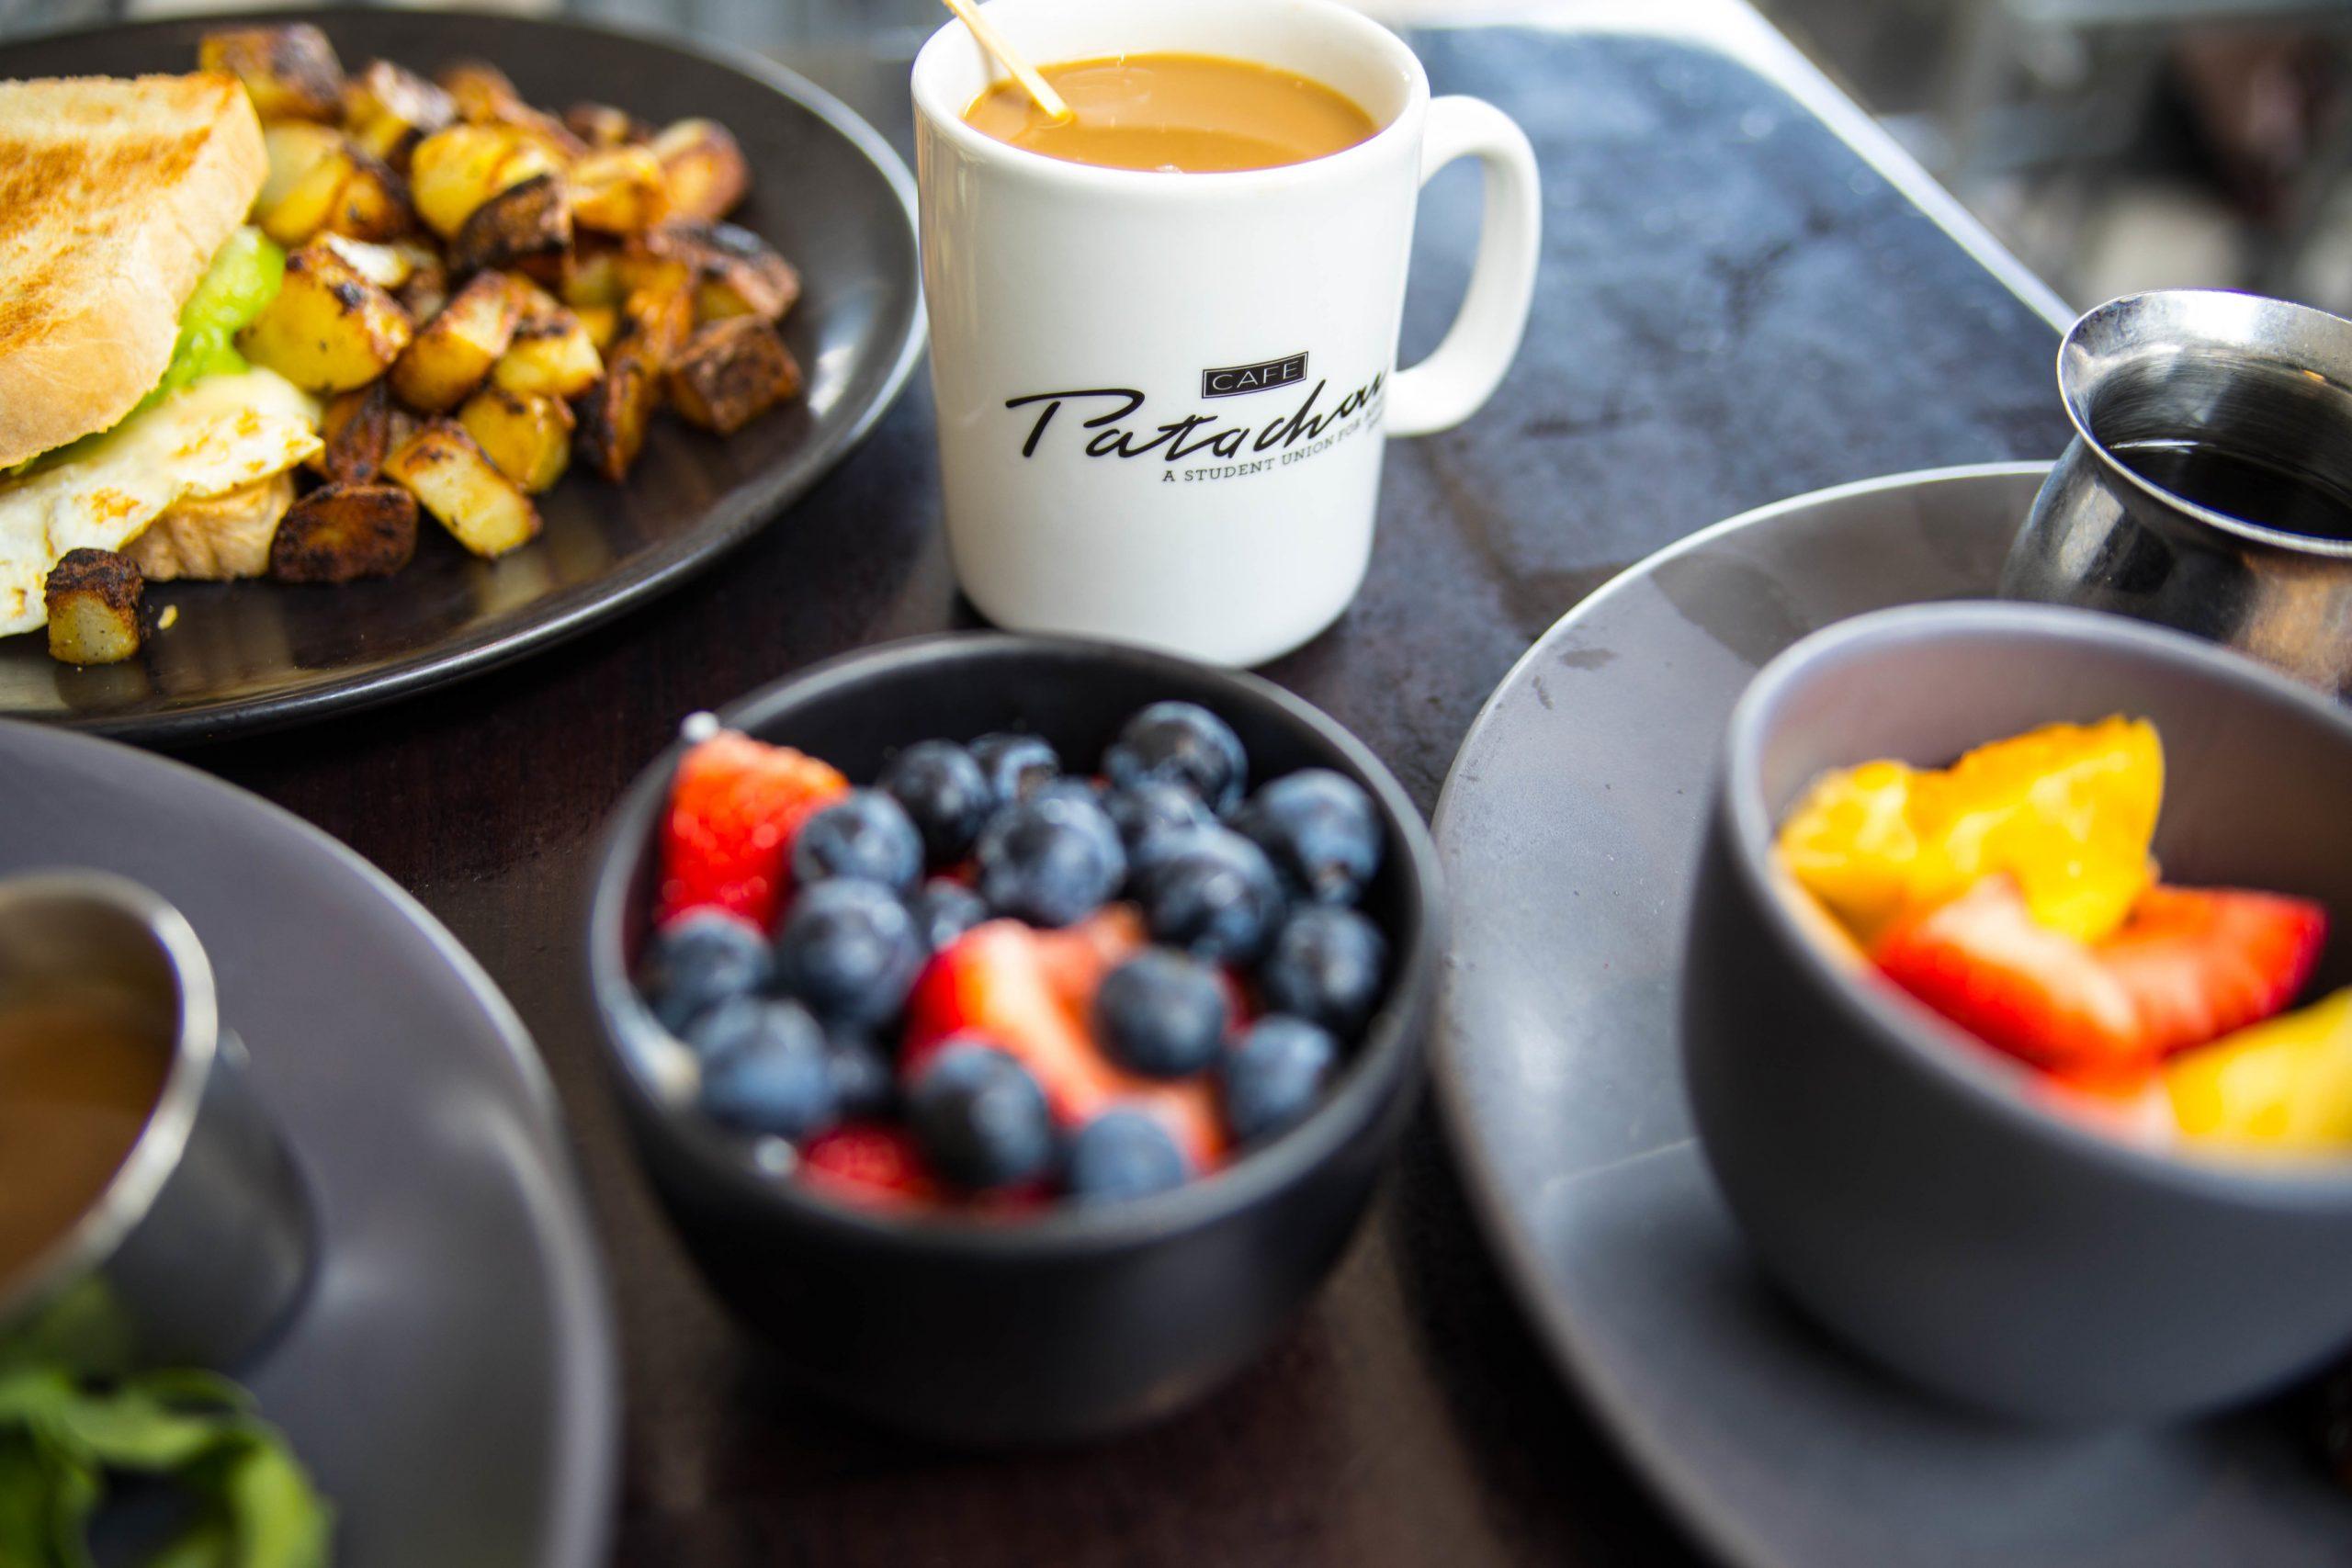 Café Patachou Indianapolis Luxury Travel Guide by Annie Fairfax